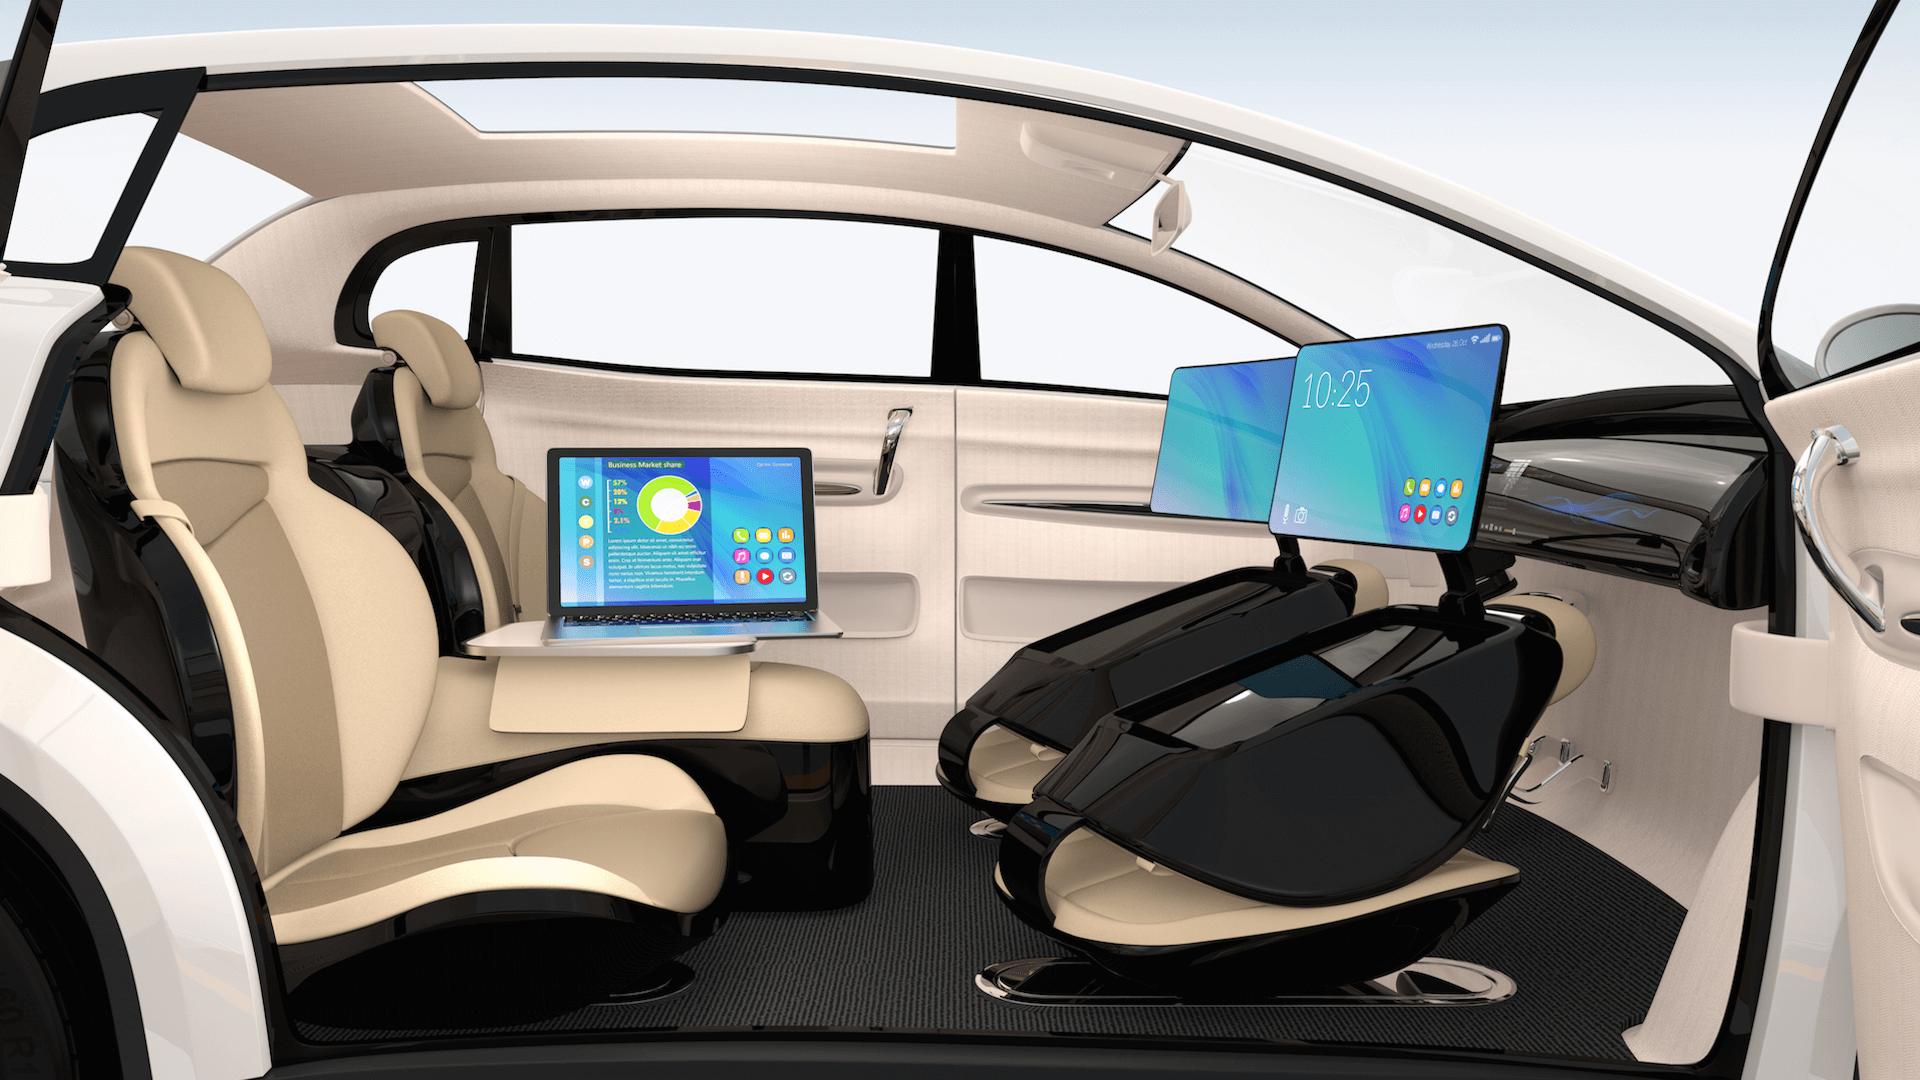 Analyst David Raab: We'll have self-driving cars before we